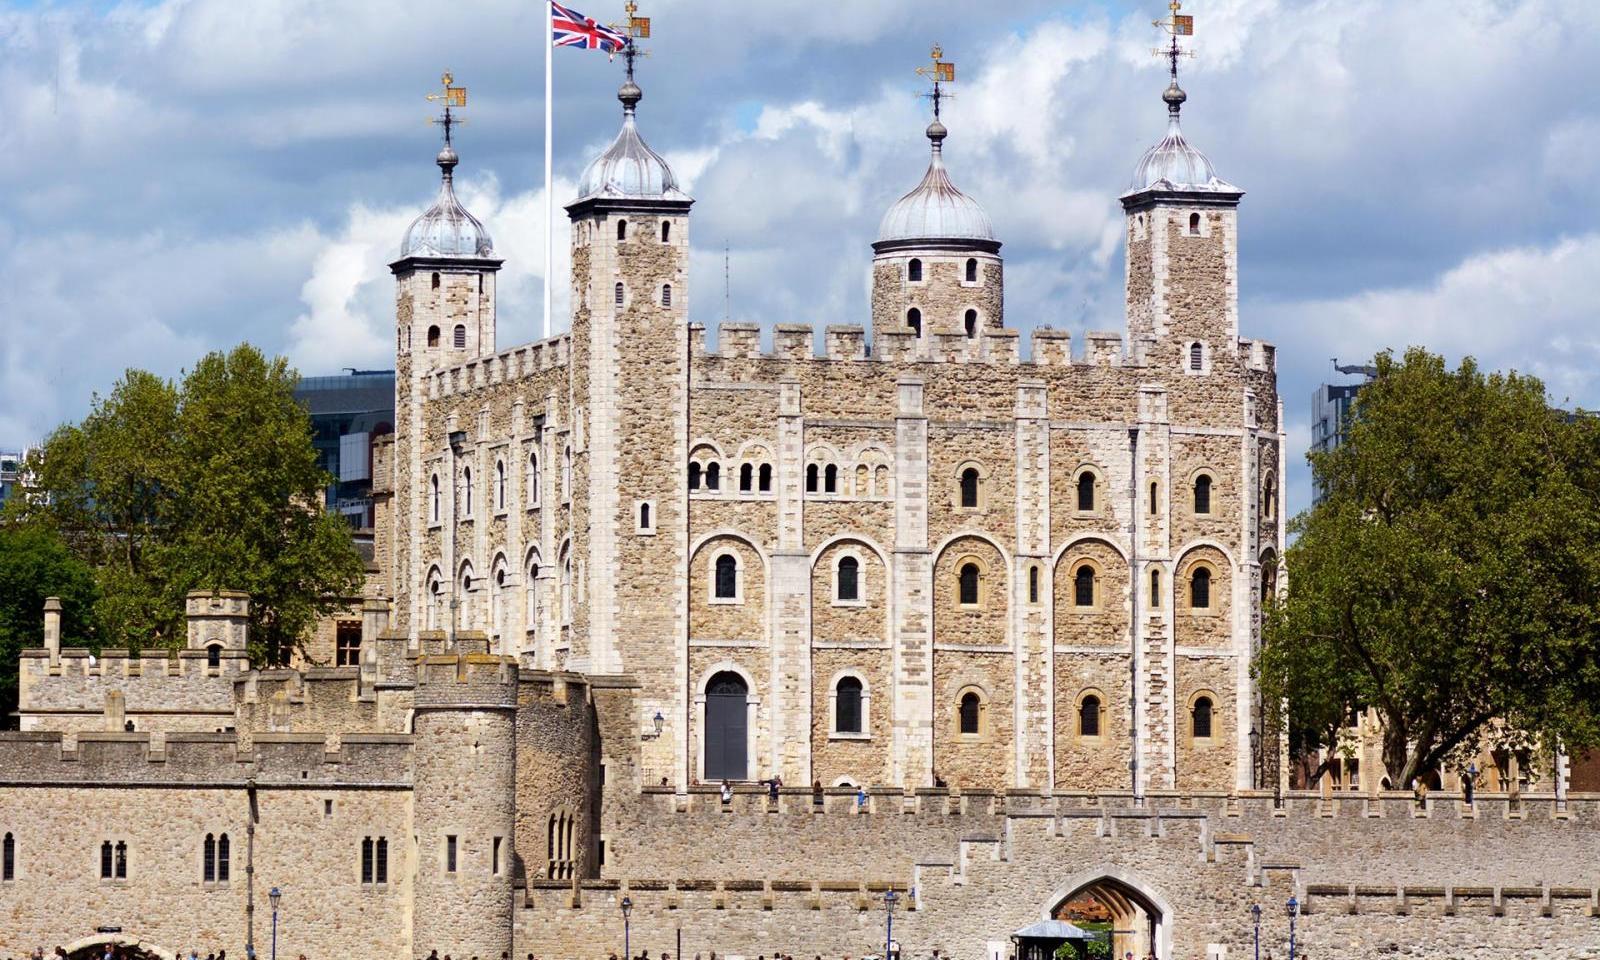 tower-of-londonAussenansicht